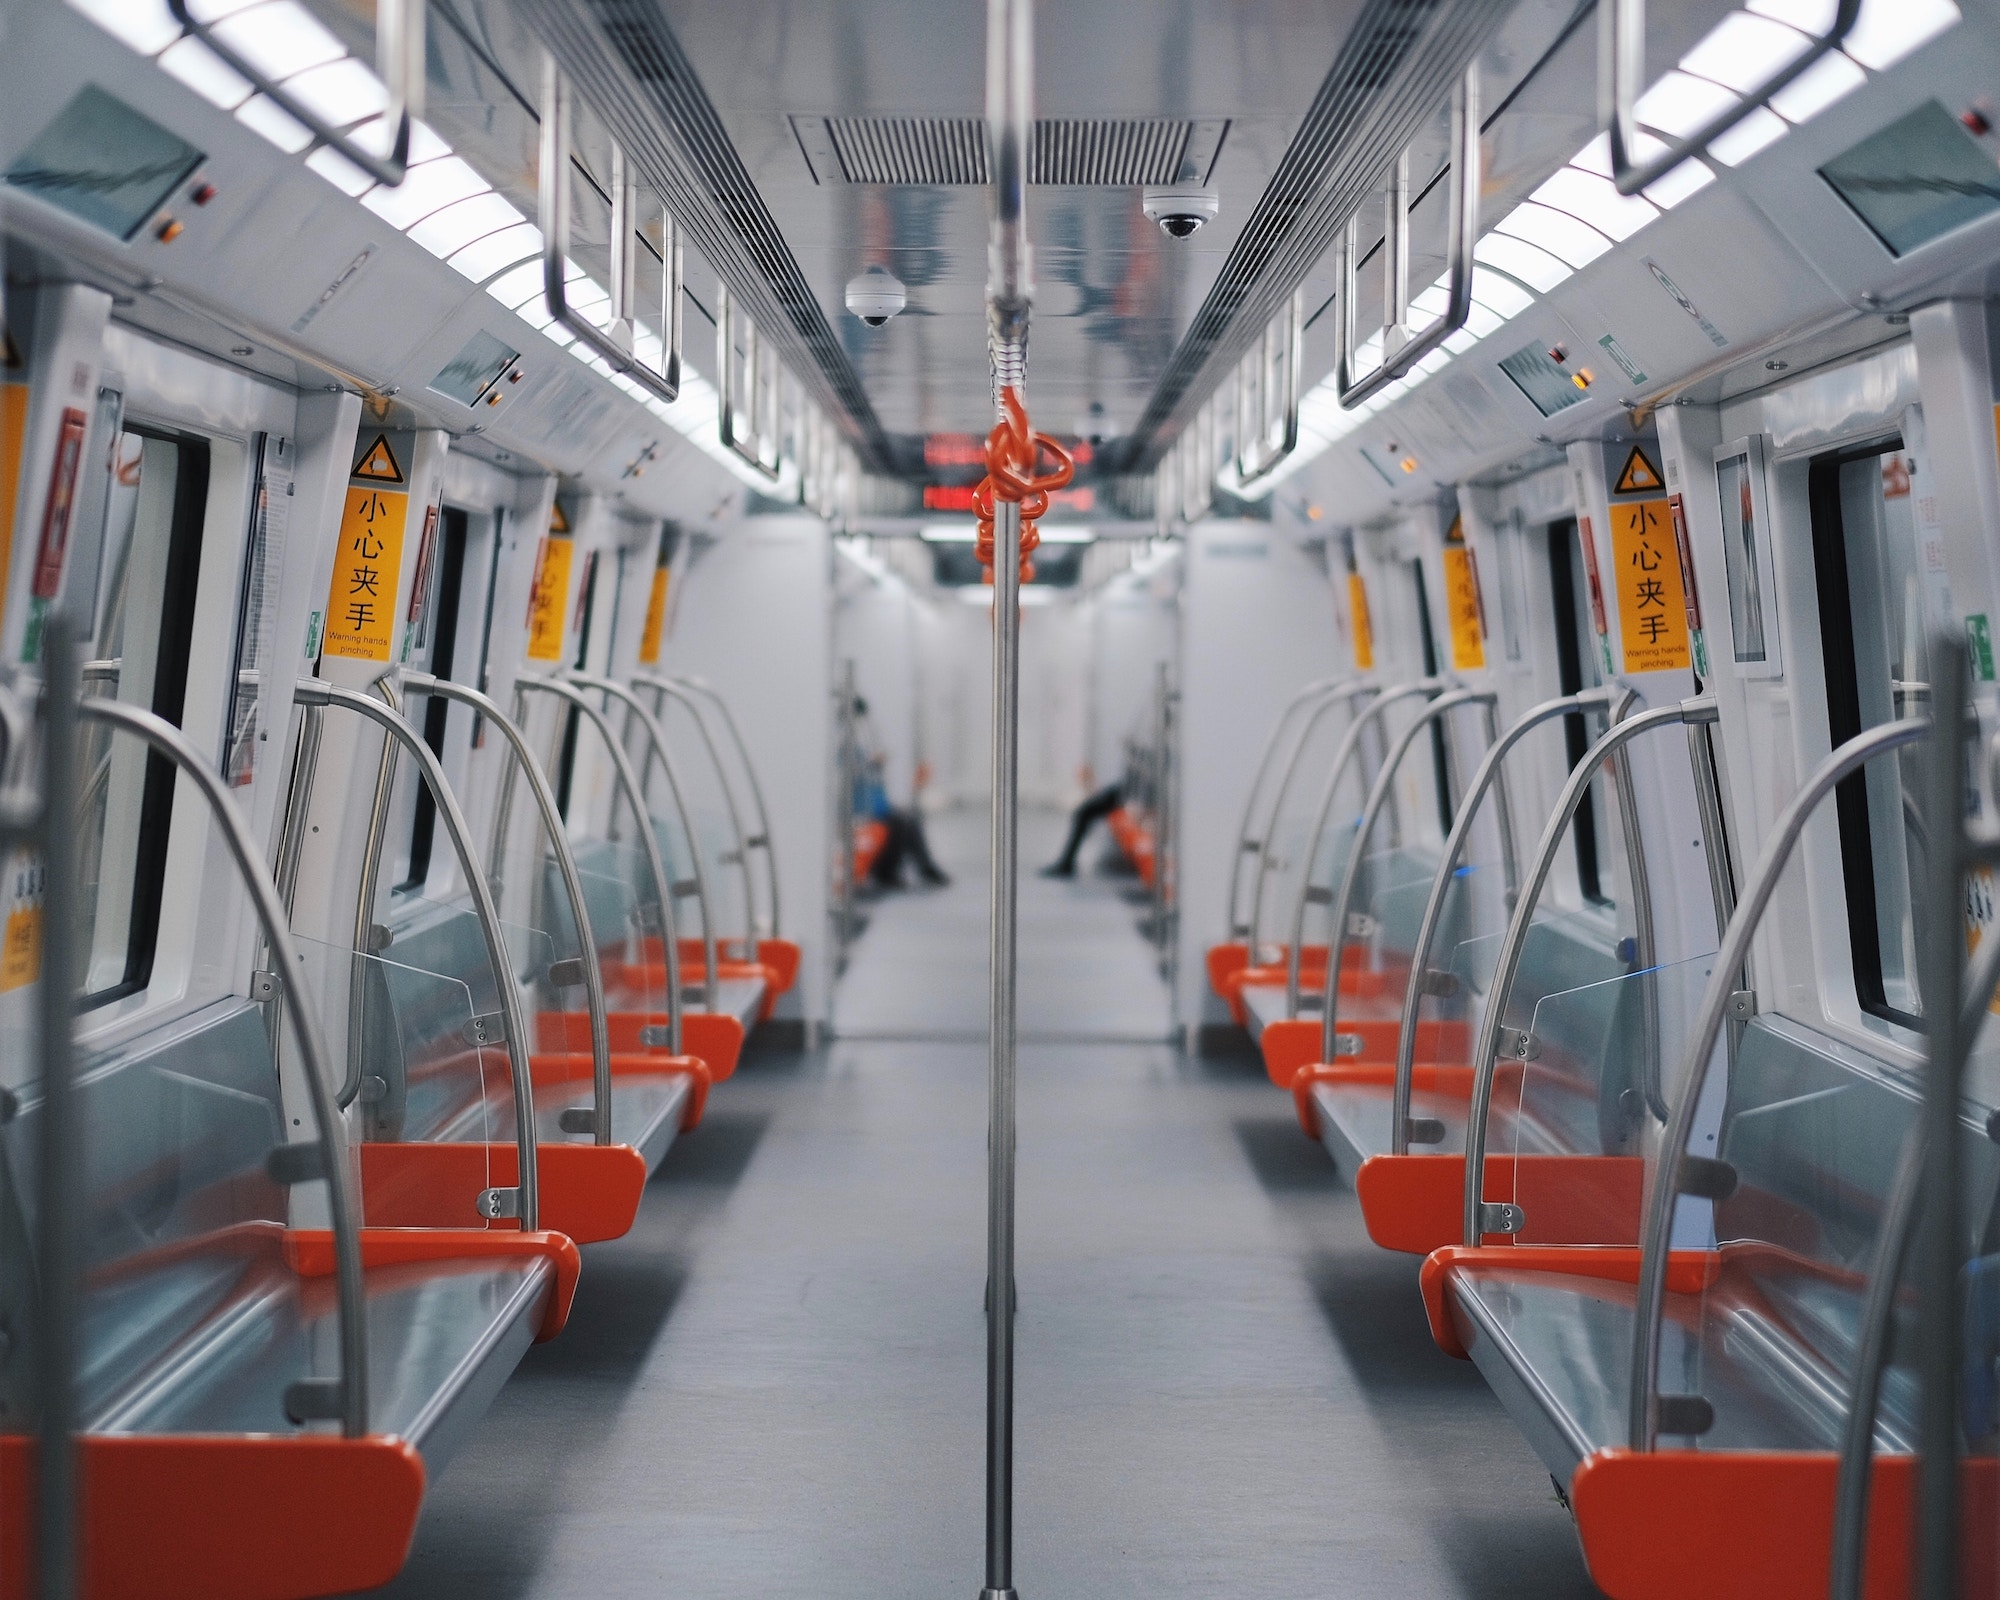 Metro v Pekini stane peršym na planeti z biometrijeju zamisť kvytkiv